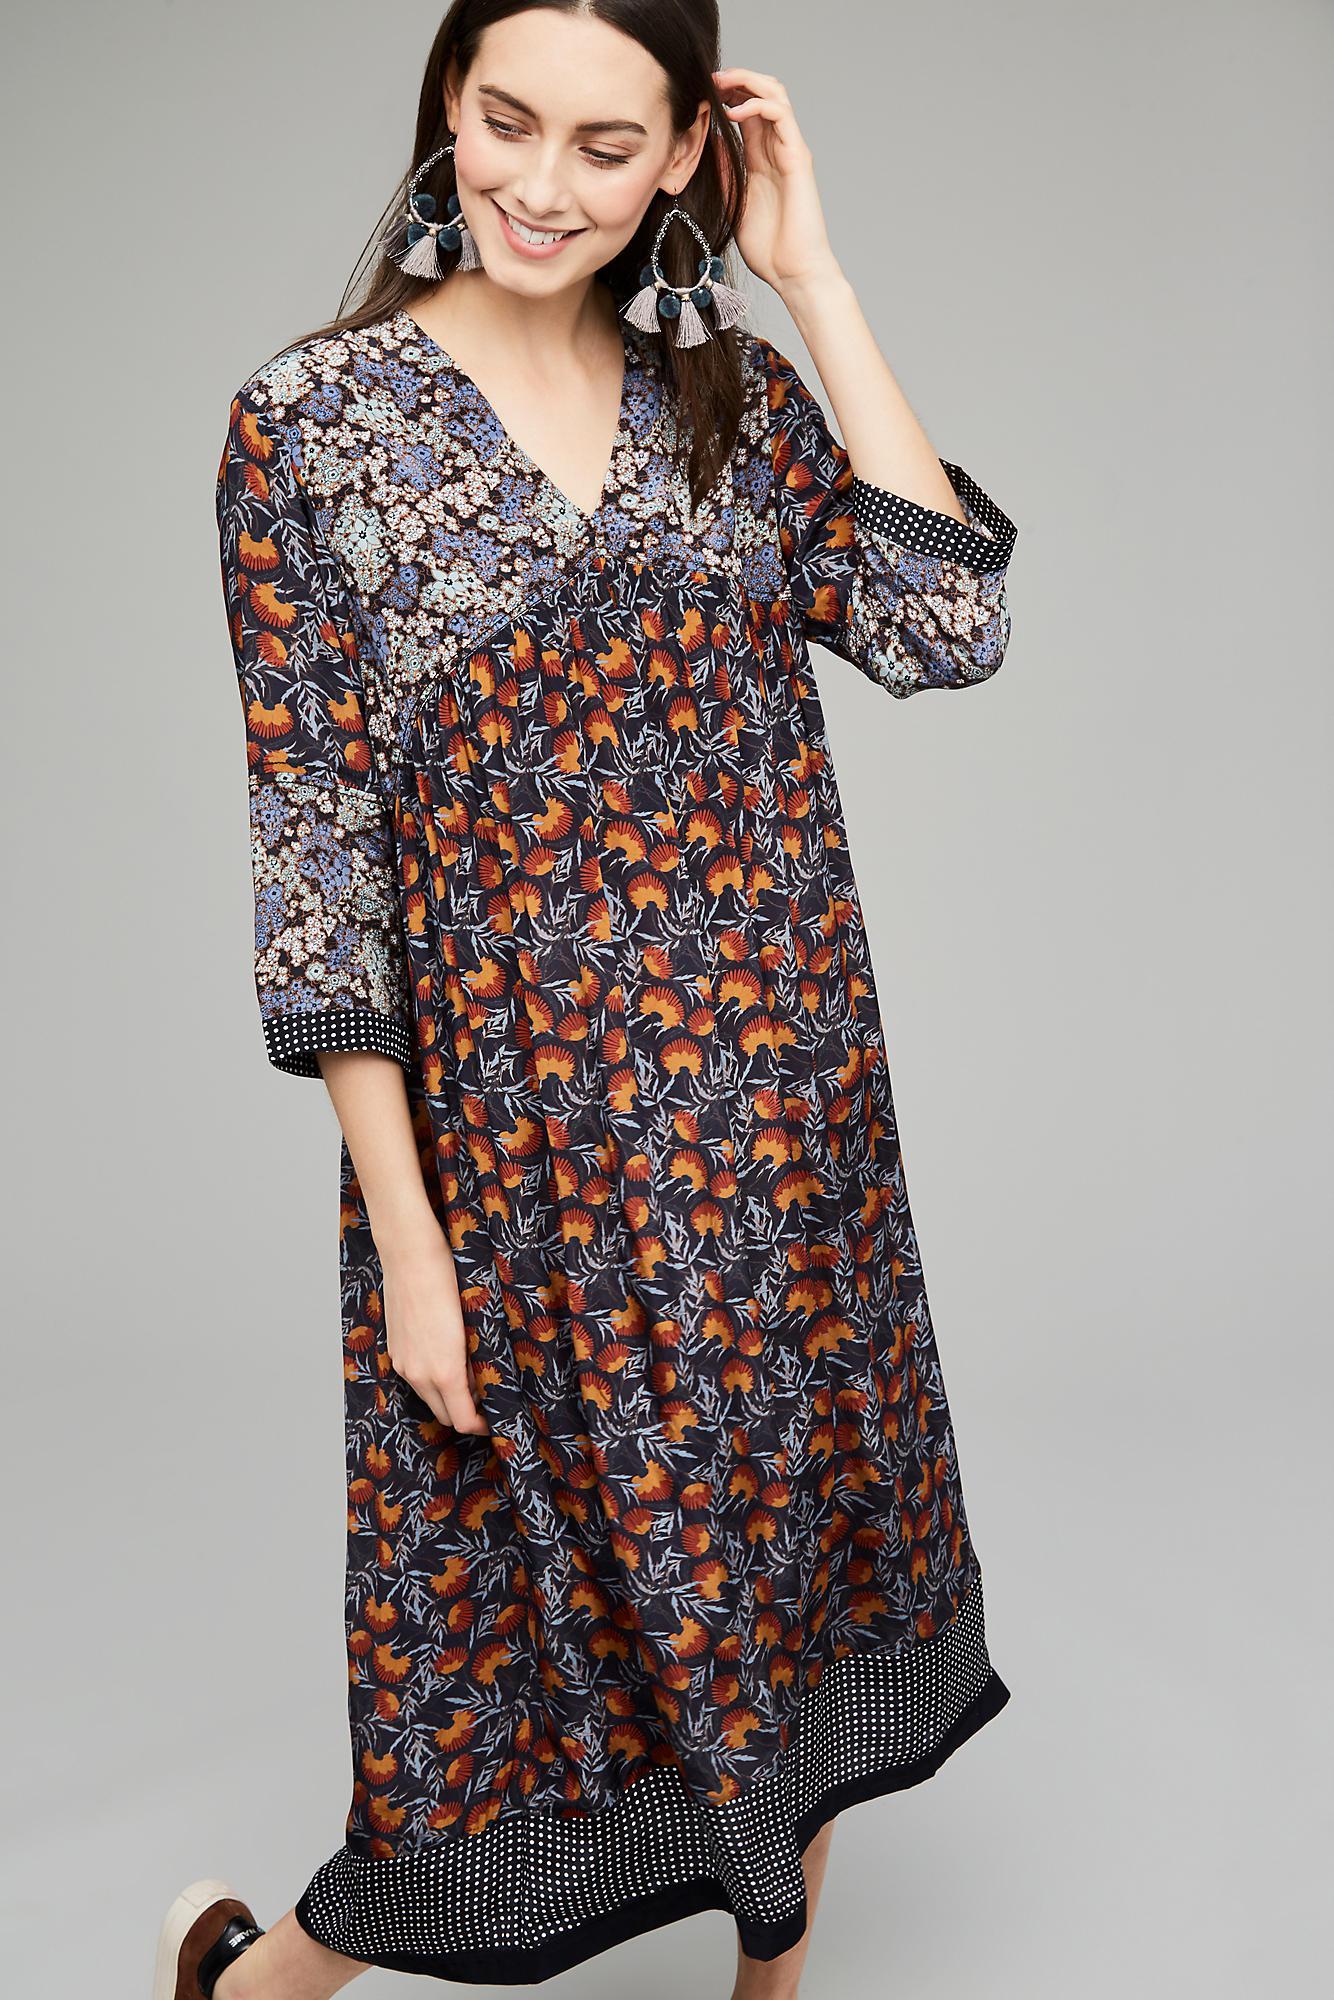 a3a7ca0f79e1 Anthropologie Janita Floral Peasant Dress - Lyst